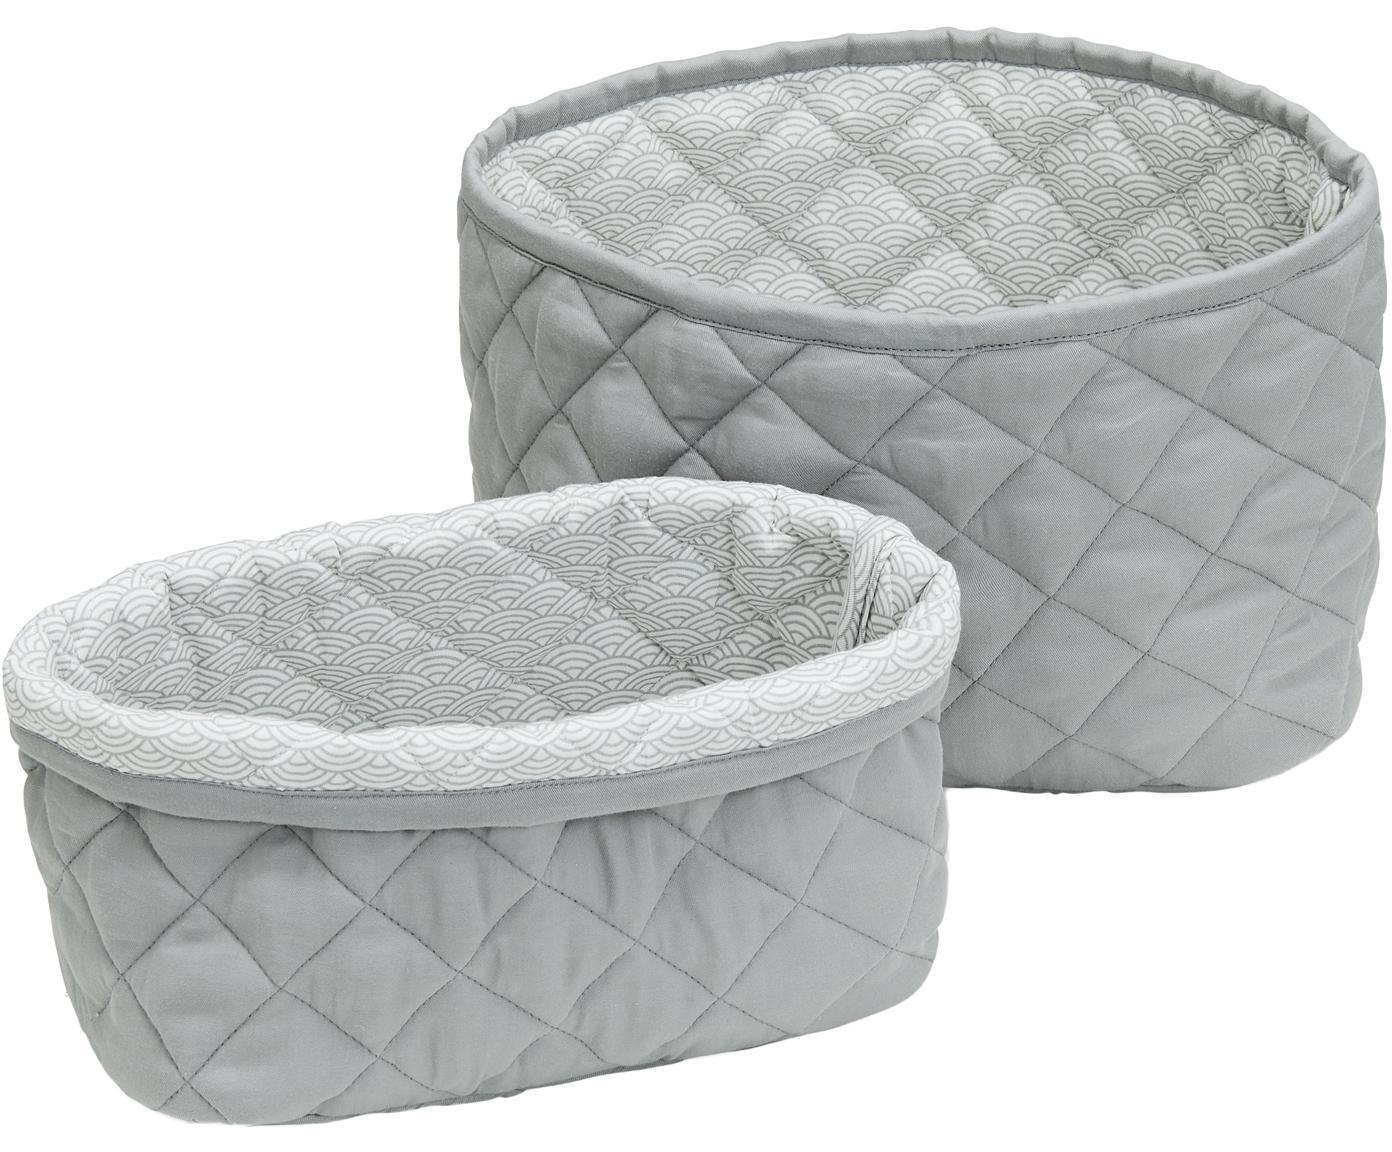 Set de cestas Wave, 2pzas., Exterior: algodón orgánico, Gris, Tamaños diferentes